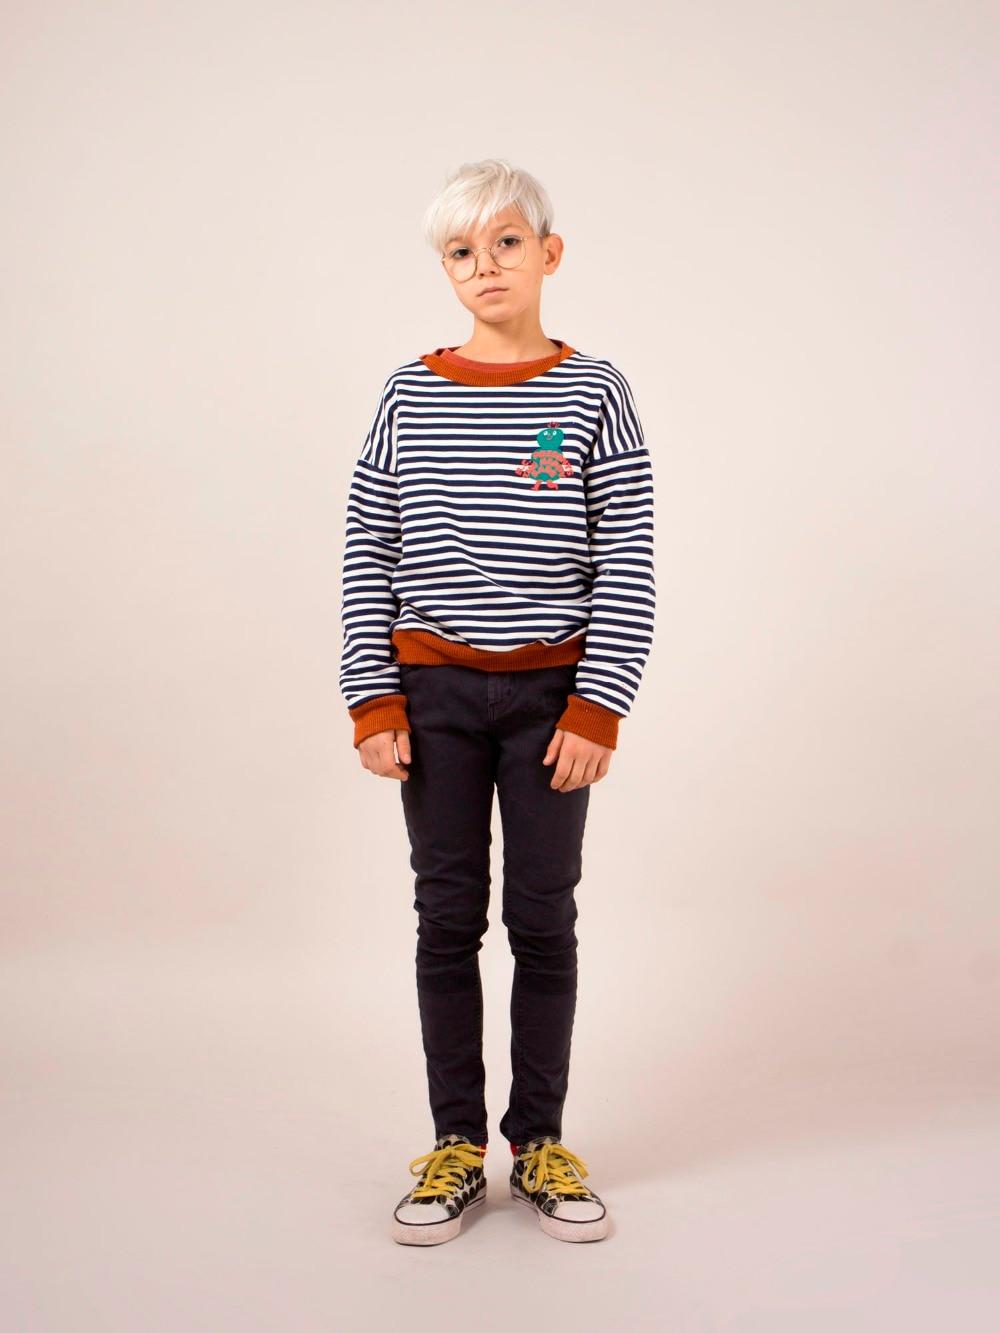 Bobo Choses Autumn Winter Kids Clothes Long Sleeve T-shirt Cartoon Animal Boys Sweatshirts Baby Girls Sports Tees Tops #6